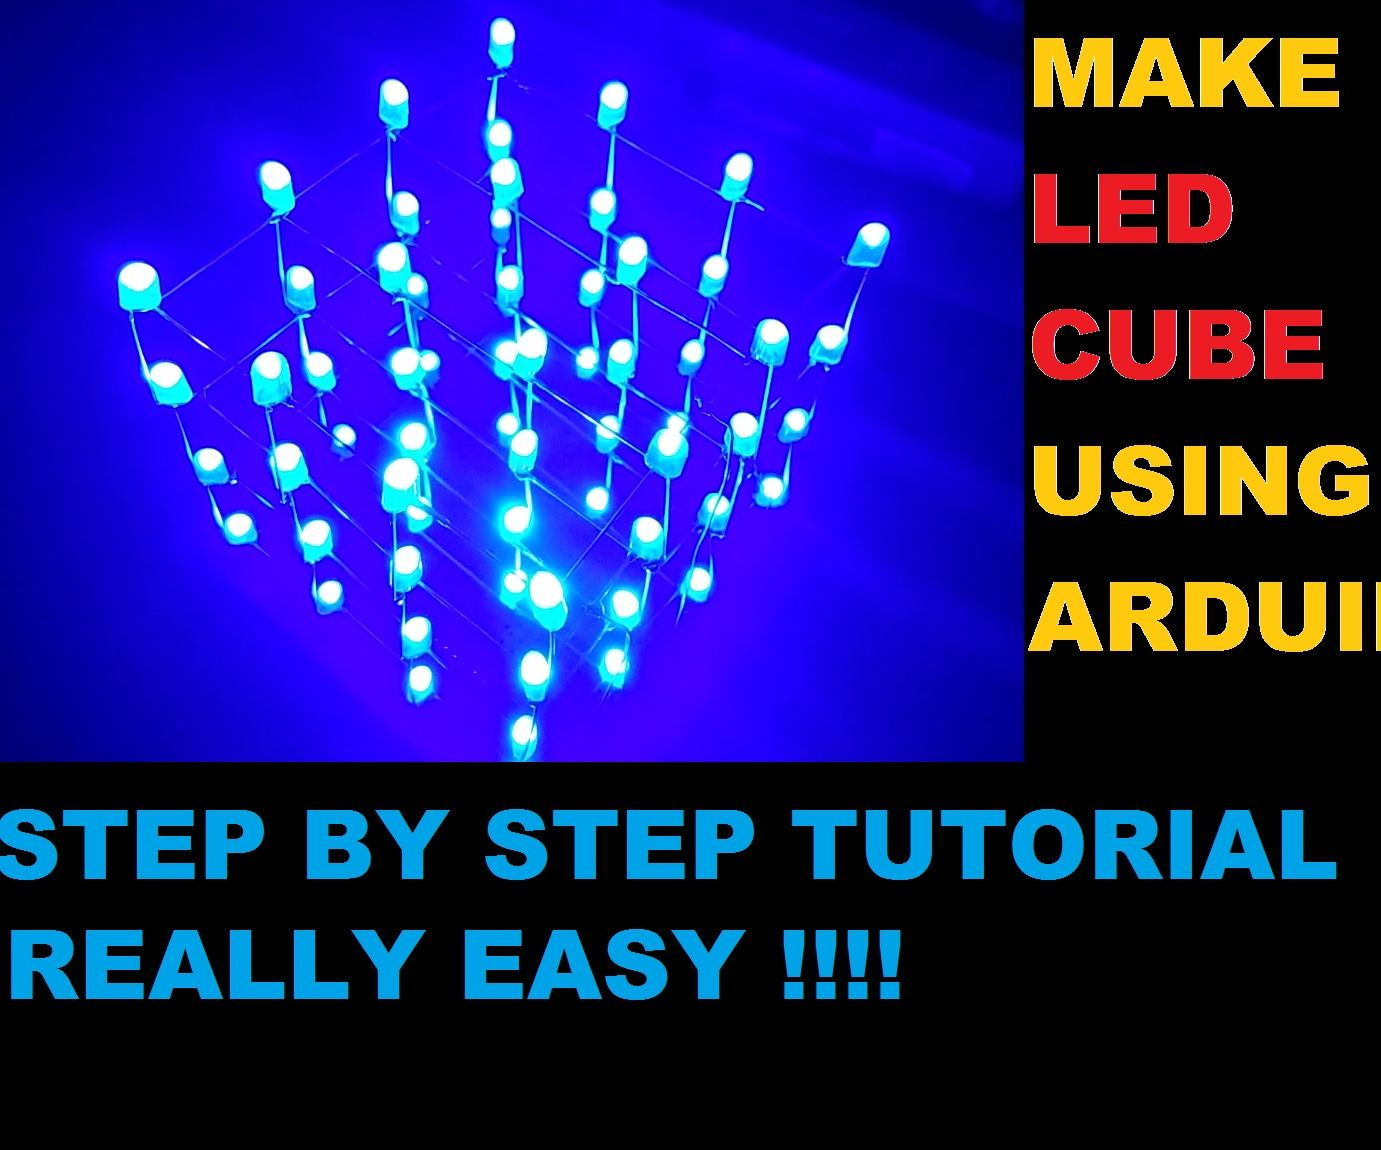 LED CUBE 4X4X4 USING ARDUINO UNO